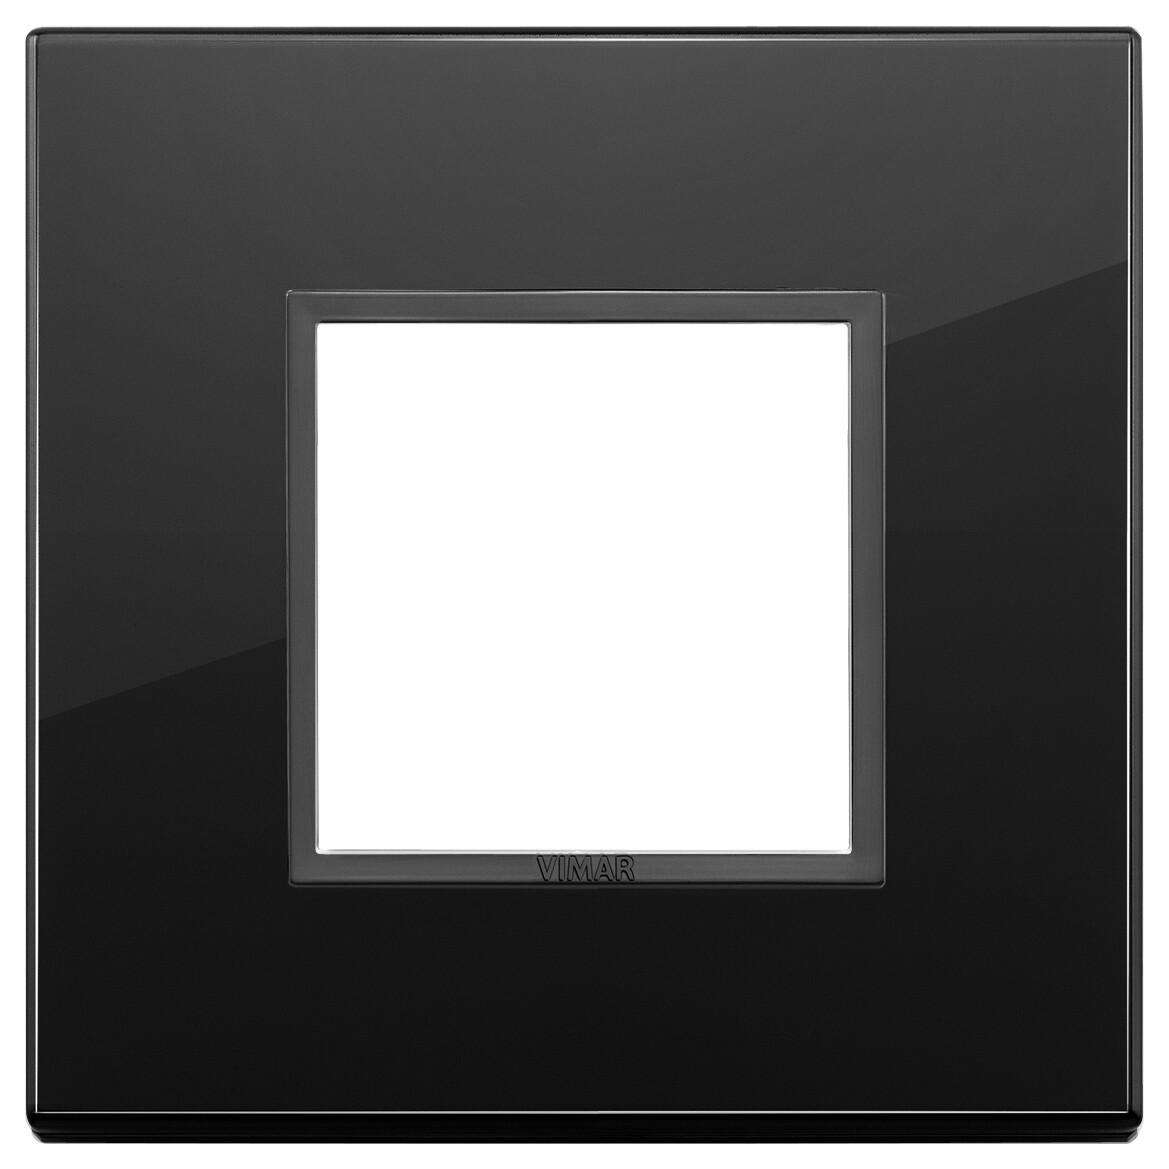 Накладка Evo на 2 модуля, полностью черный бриллиант